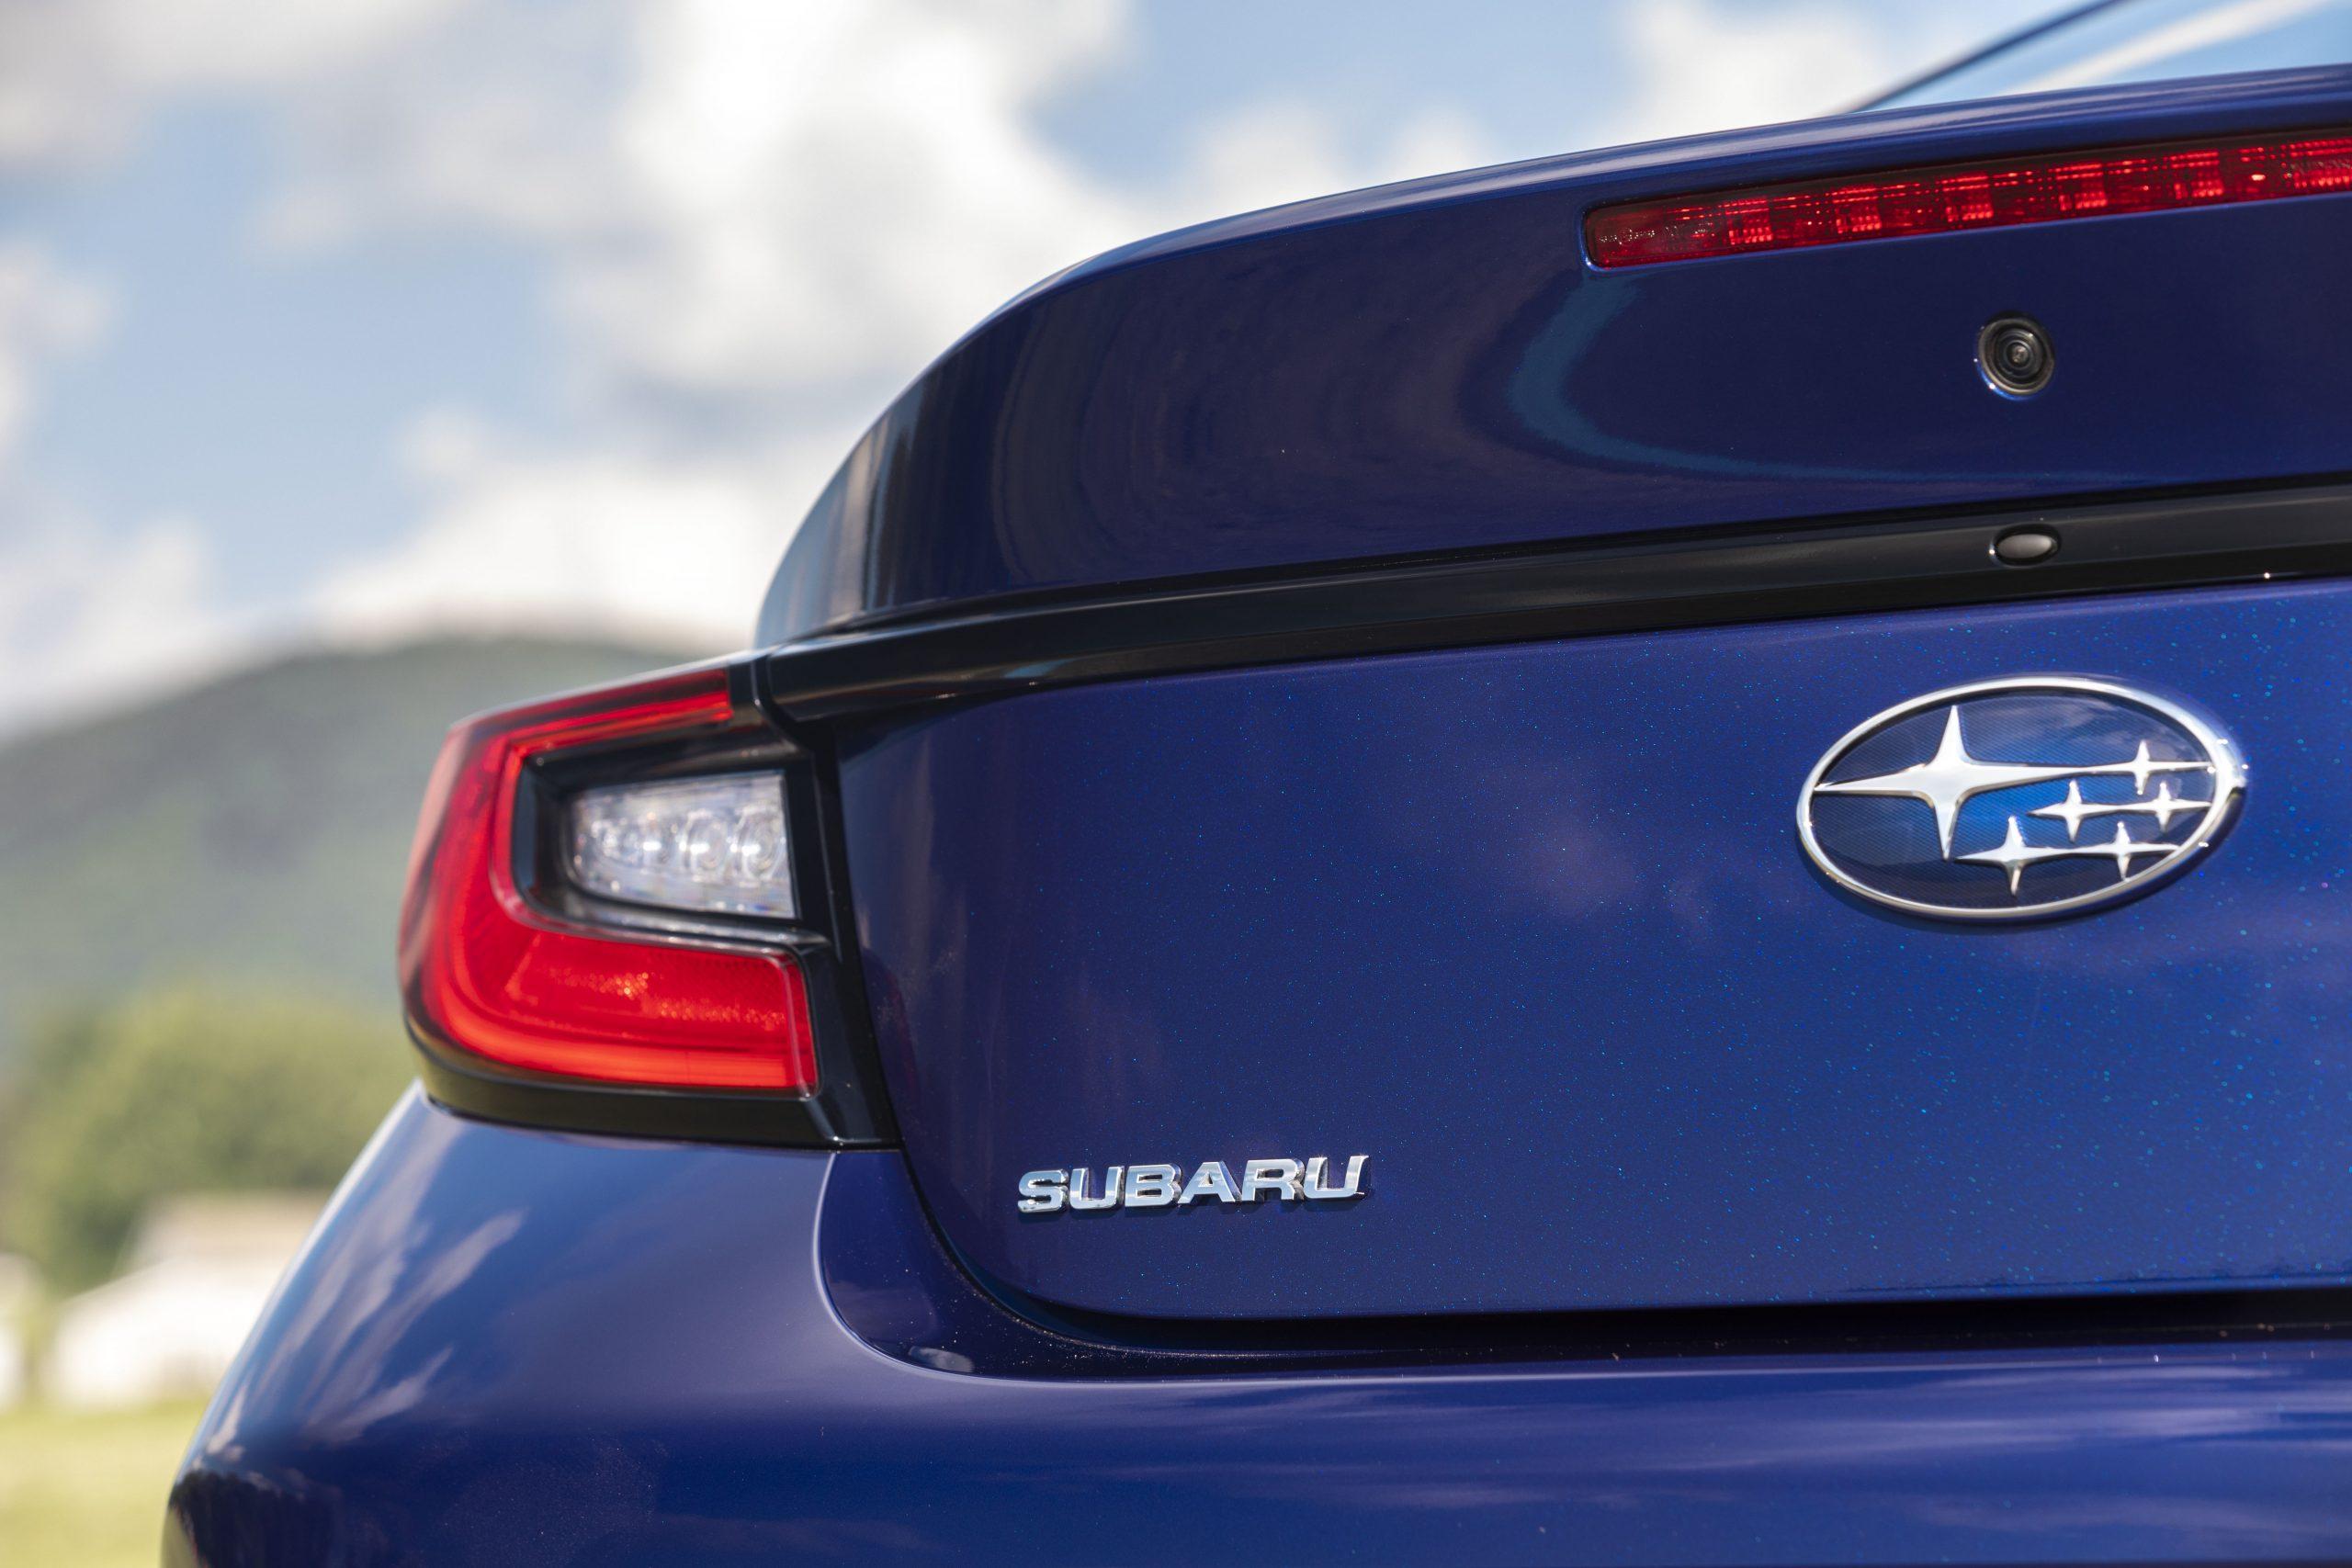 2022 Subaru BRZ rear detail close